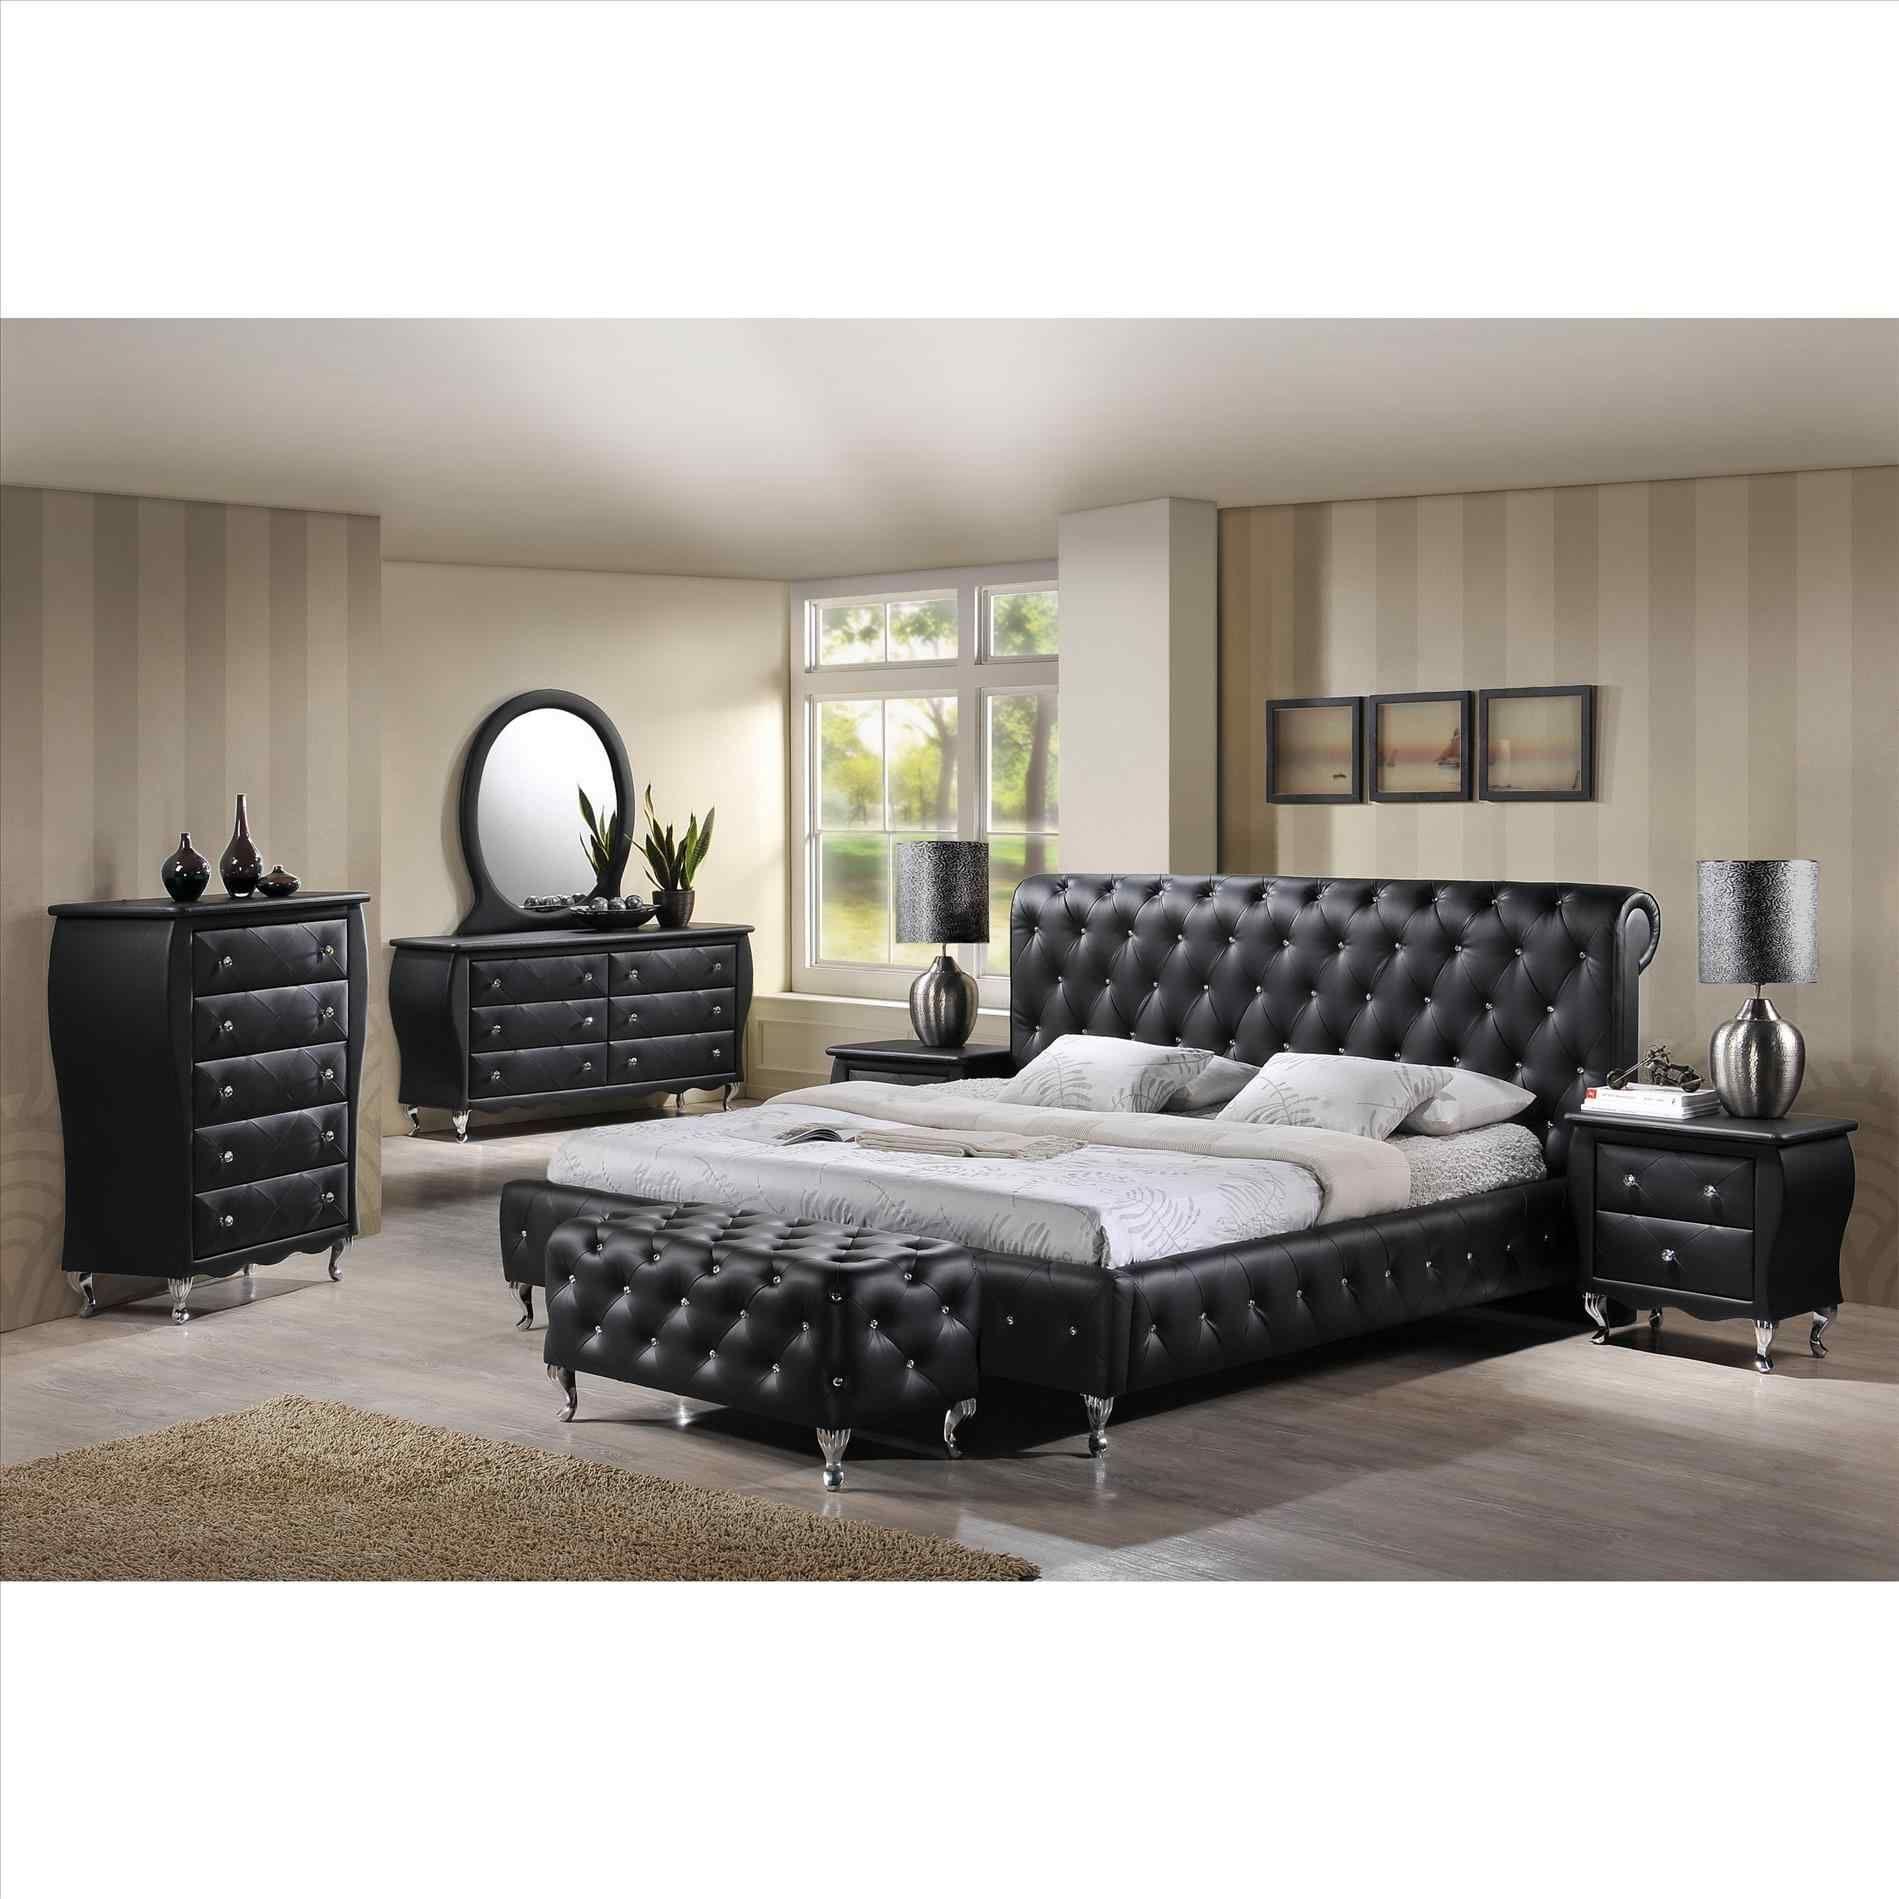 Ordinaire Awesome Top 10 Luxurious Feminine Bedroom Sets Ideas Https://breakpr.com/